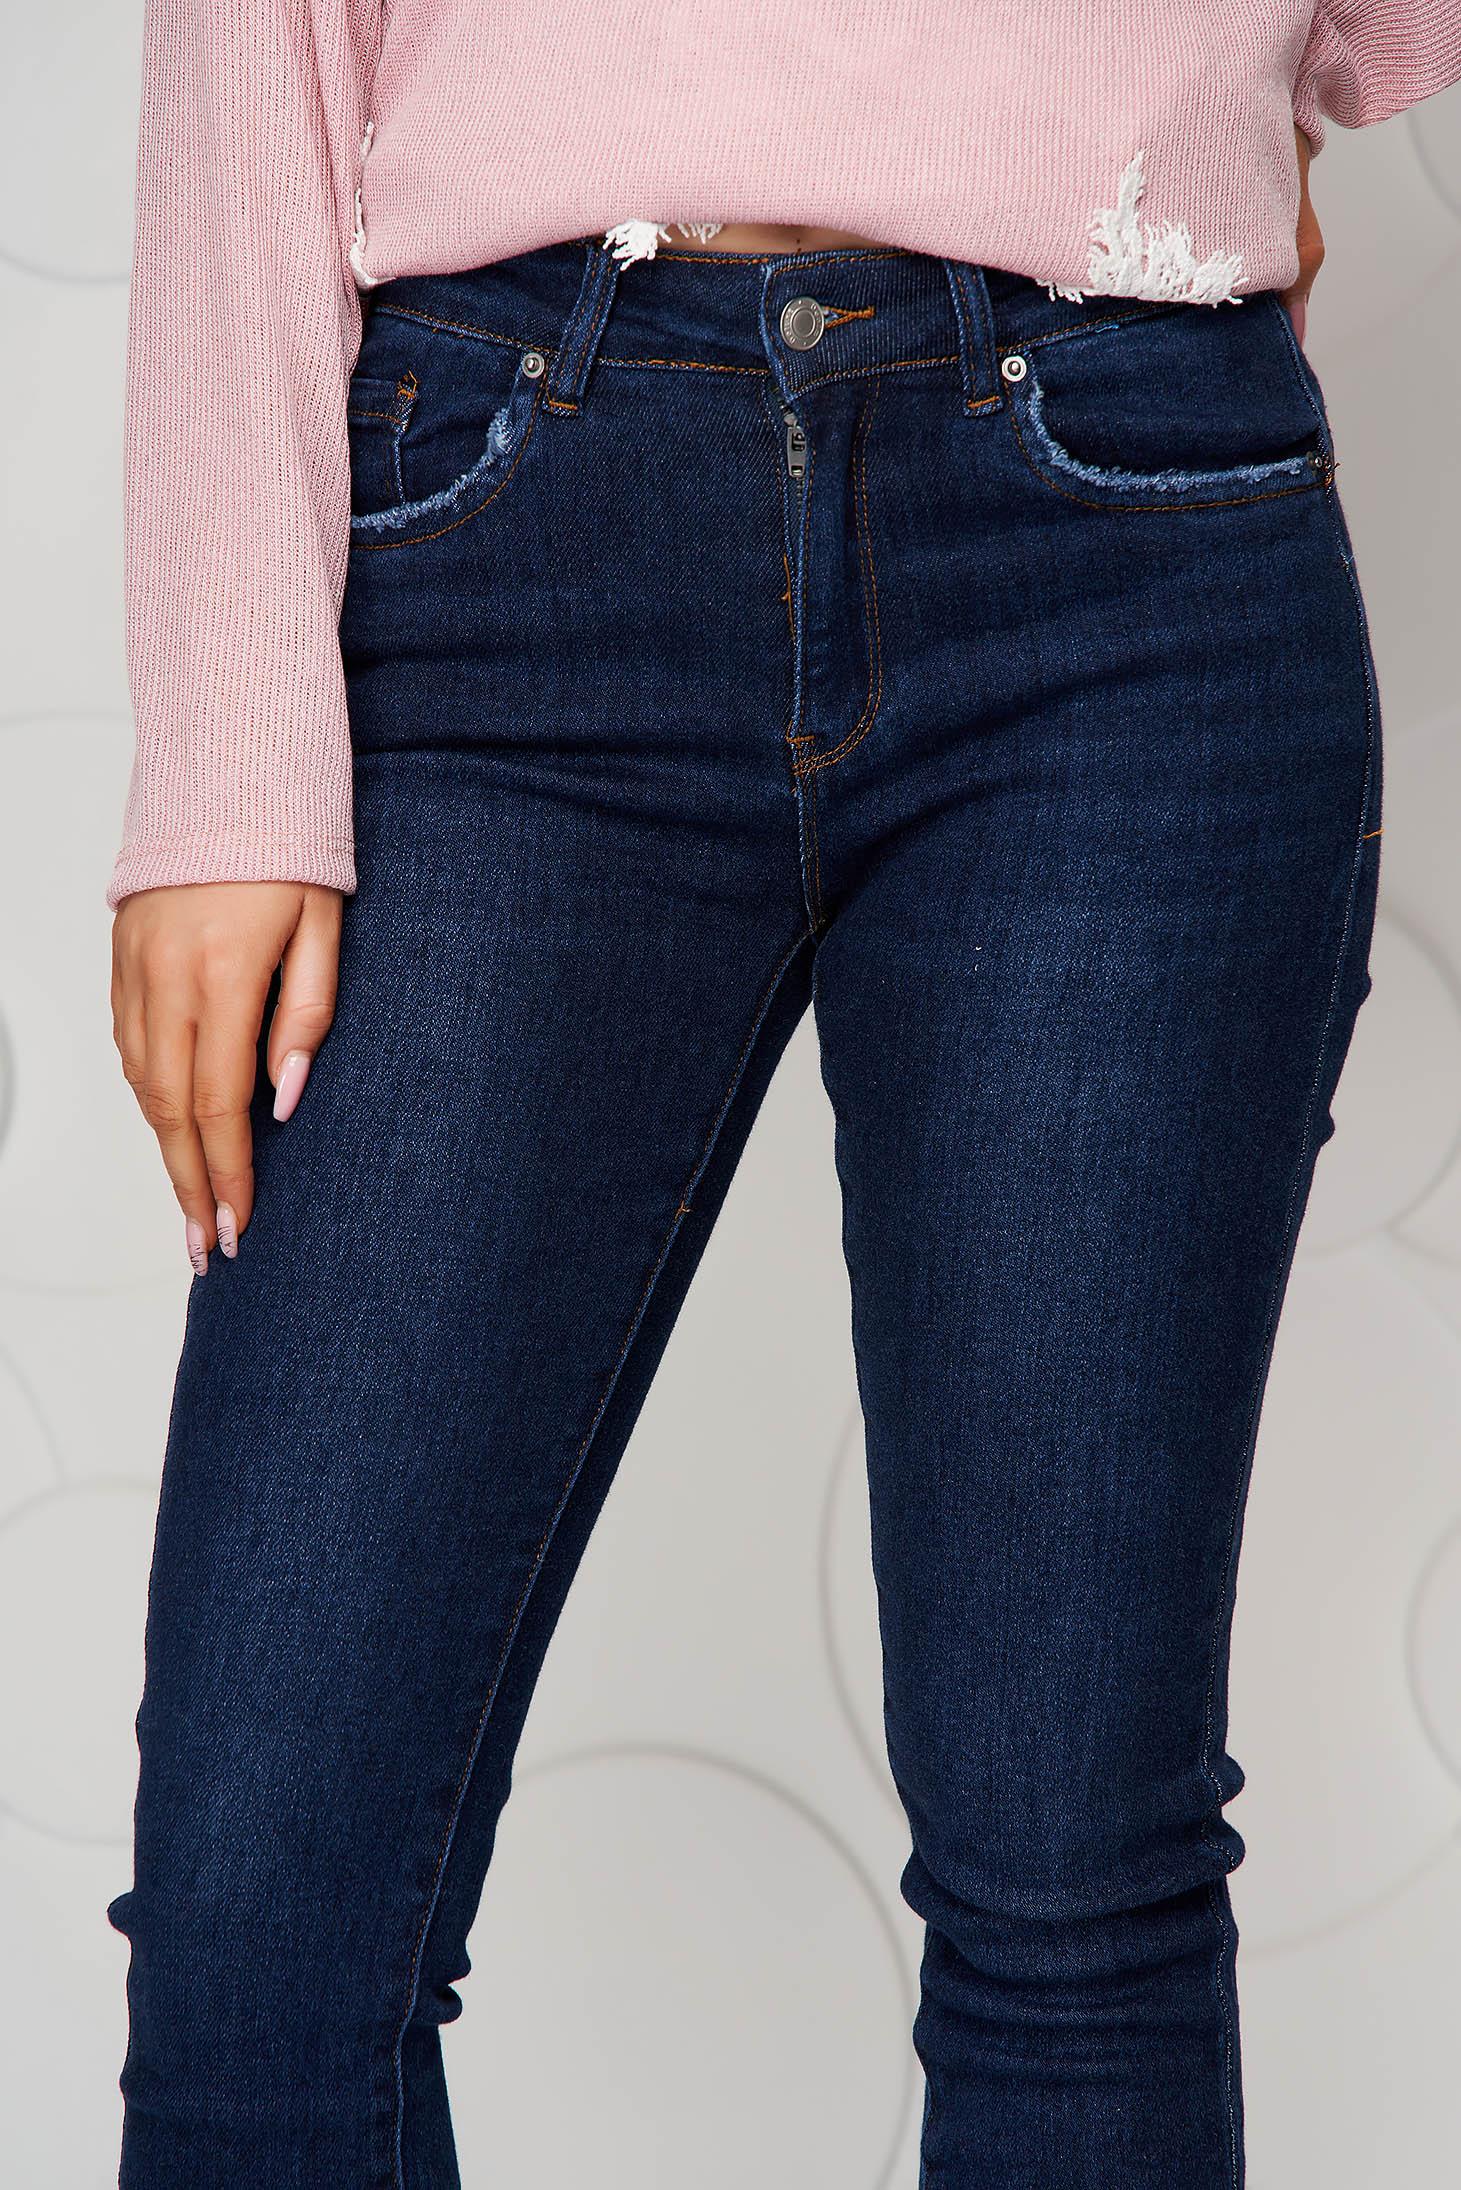 Blue jeans skinny jeans high waisted